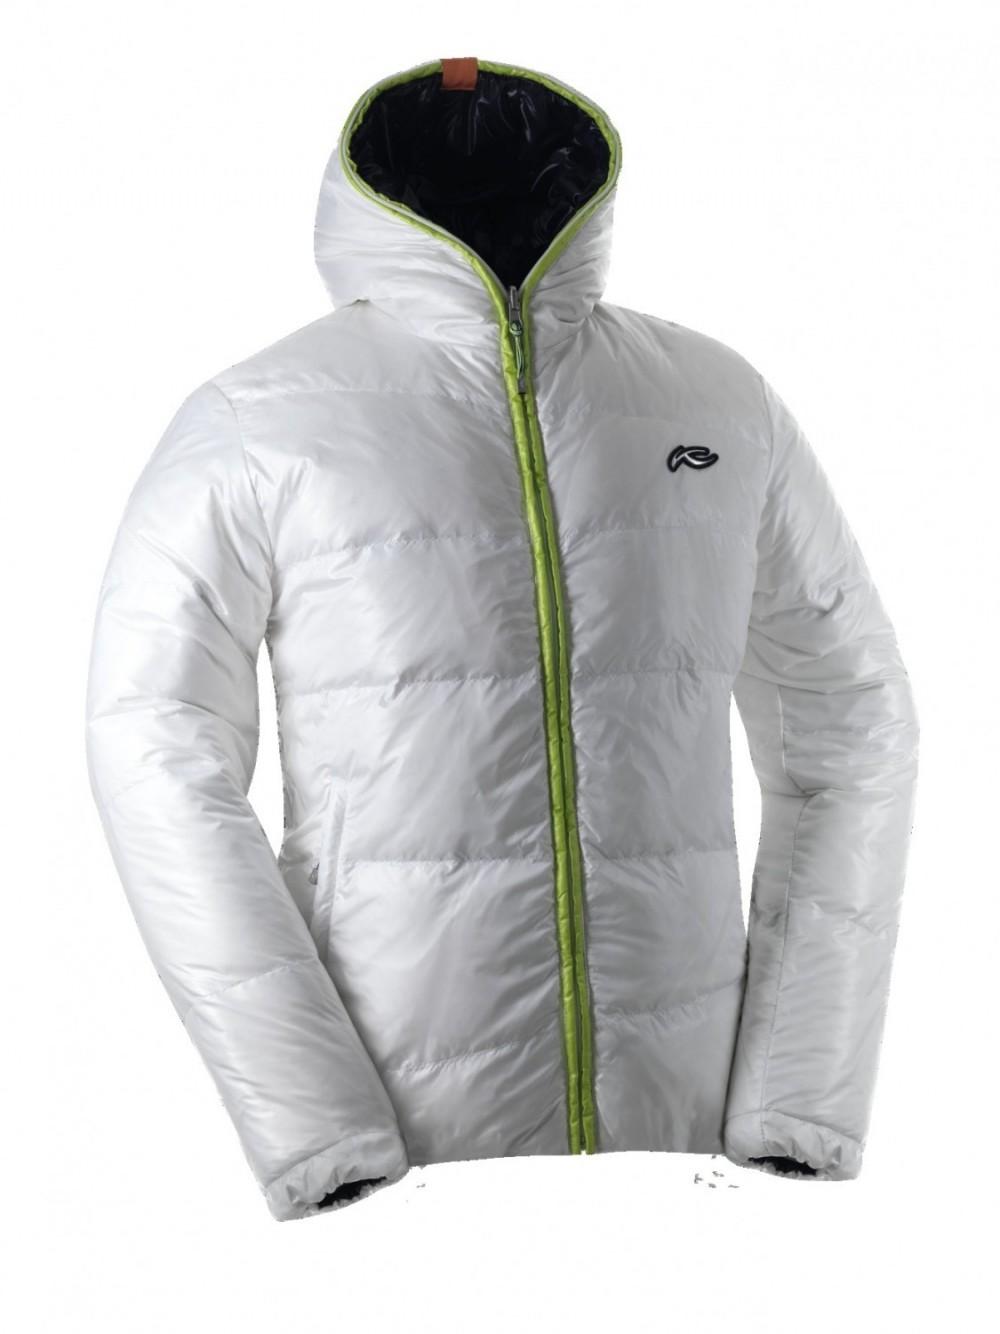 Куртка KJUS spin down jacket (размер XL) - 1